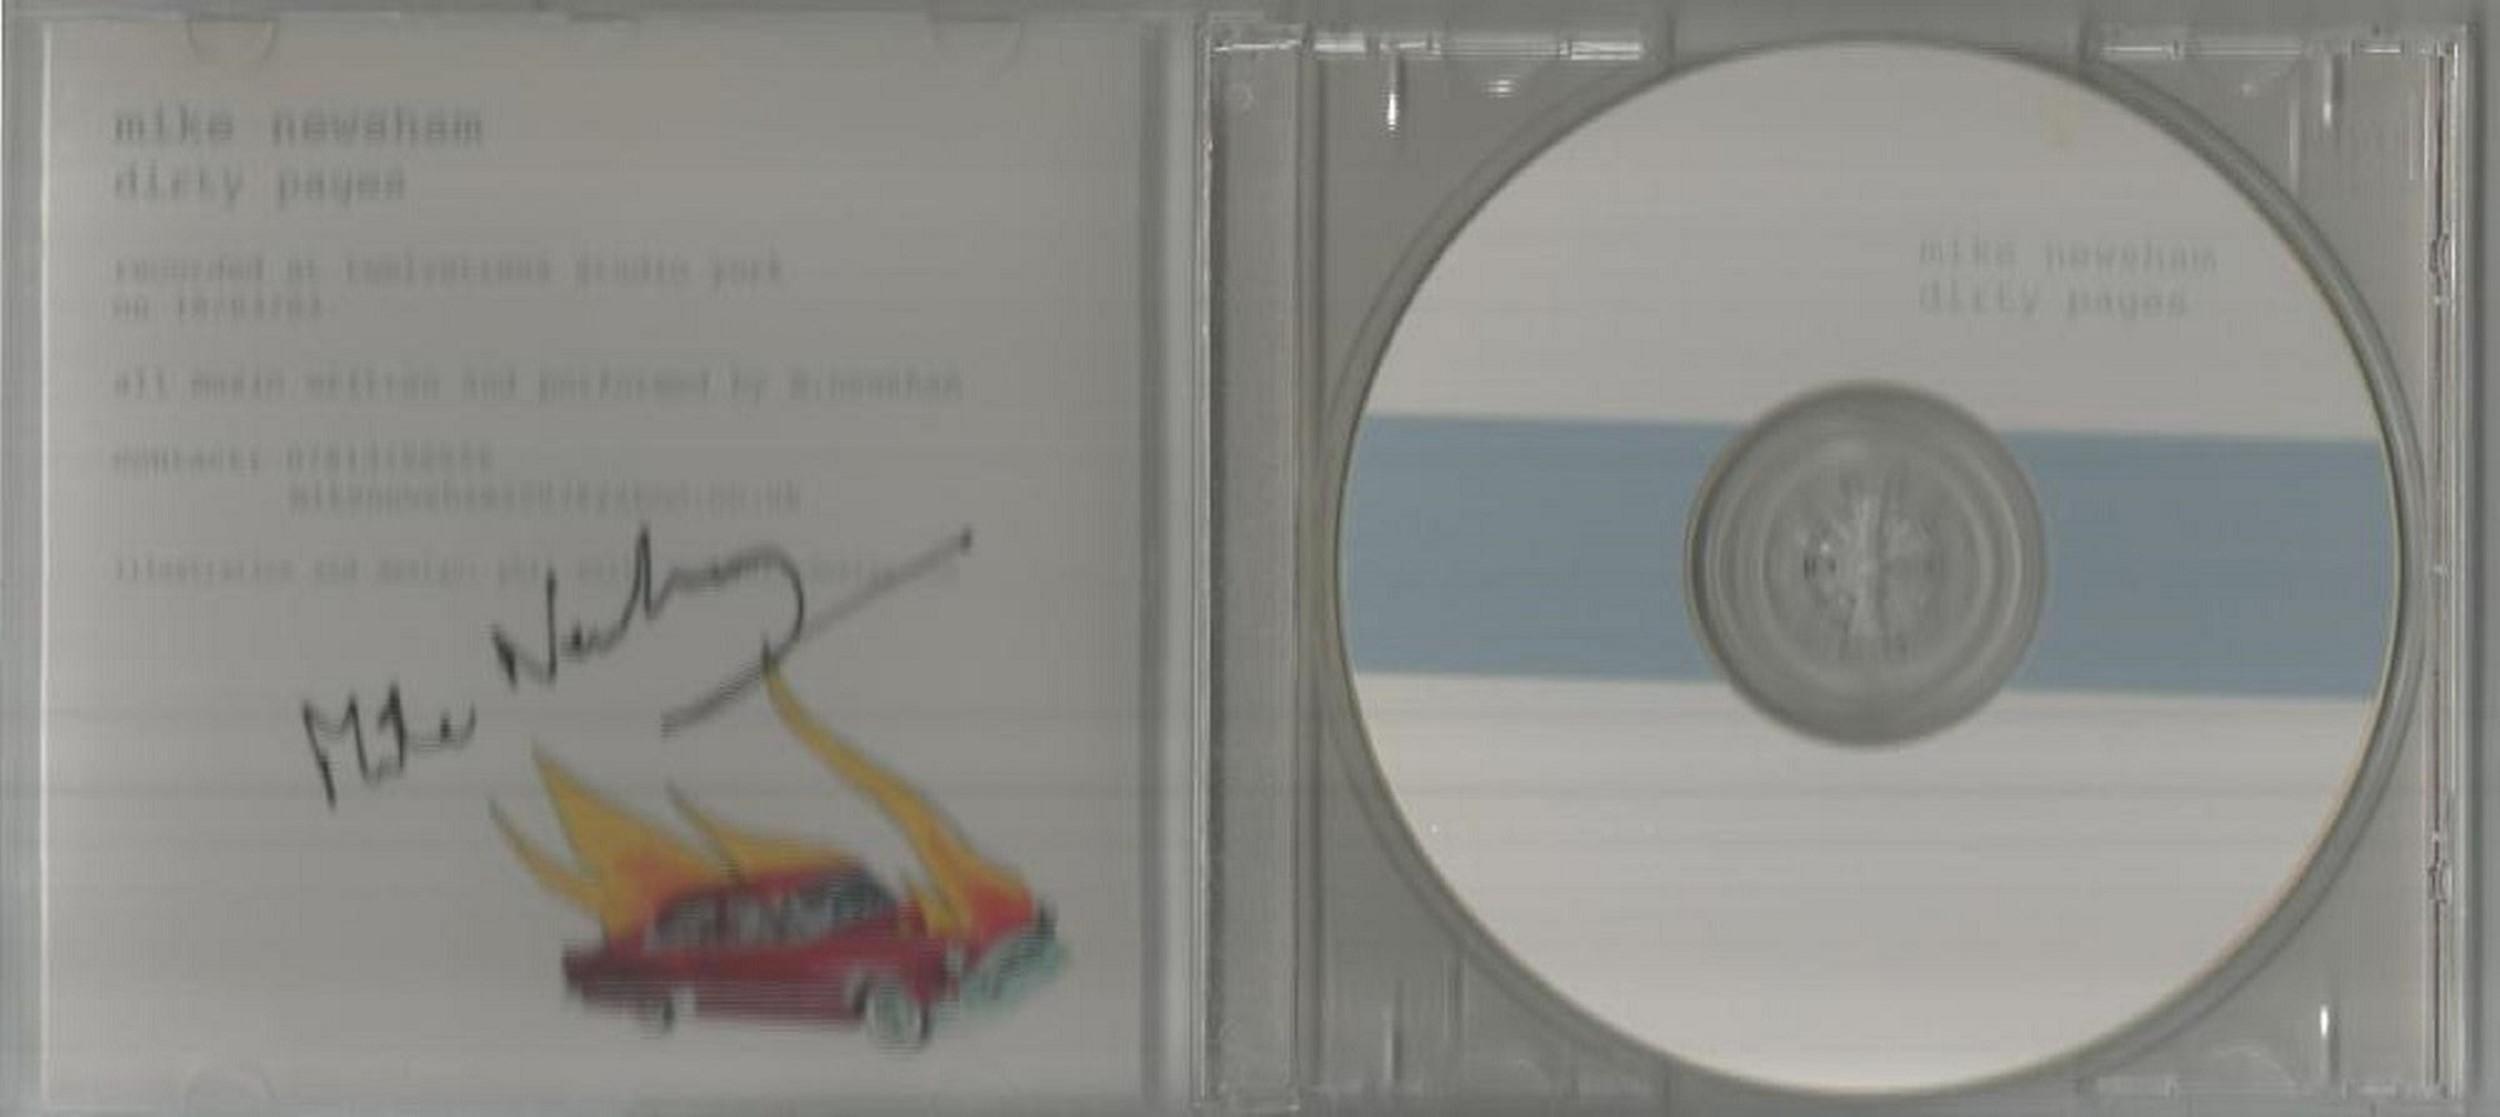 6 Signed CDs Including Joseph L Garlington Joy Disc Included, Compilation Golden Italian Hits Disc - Image 5 of 5